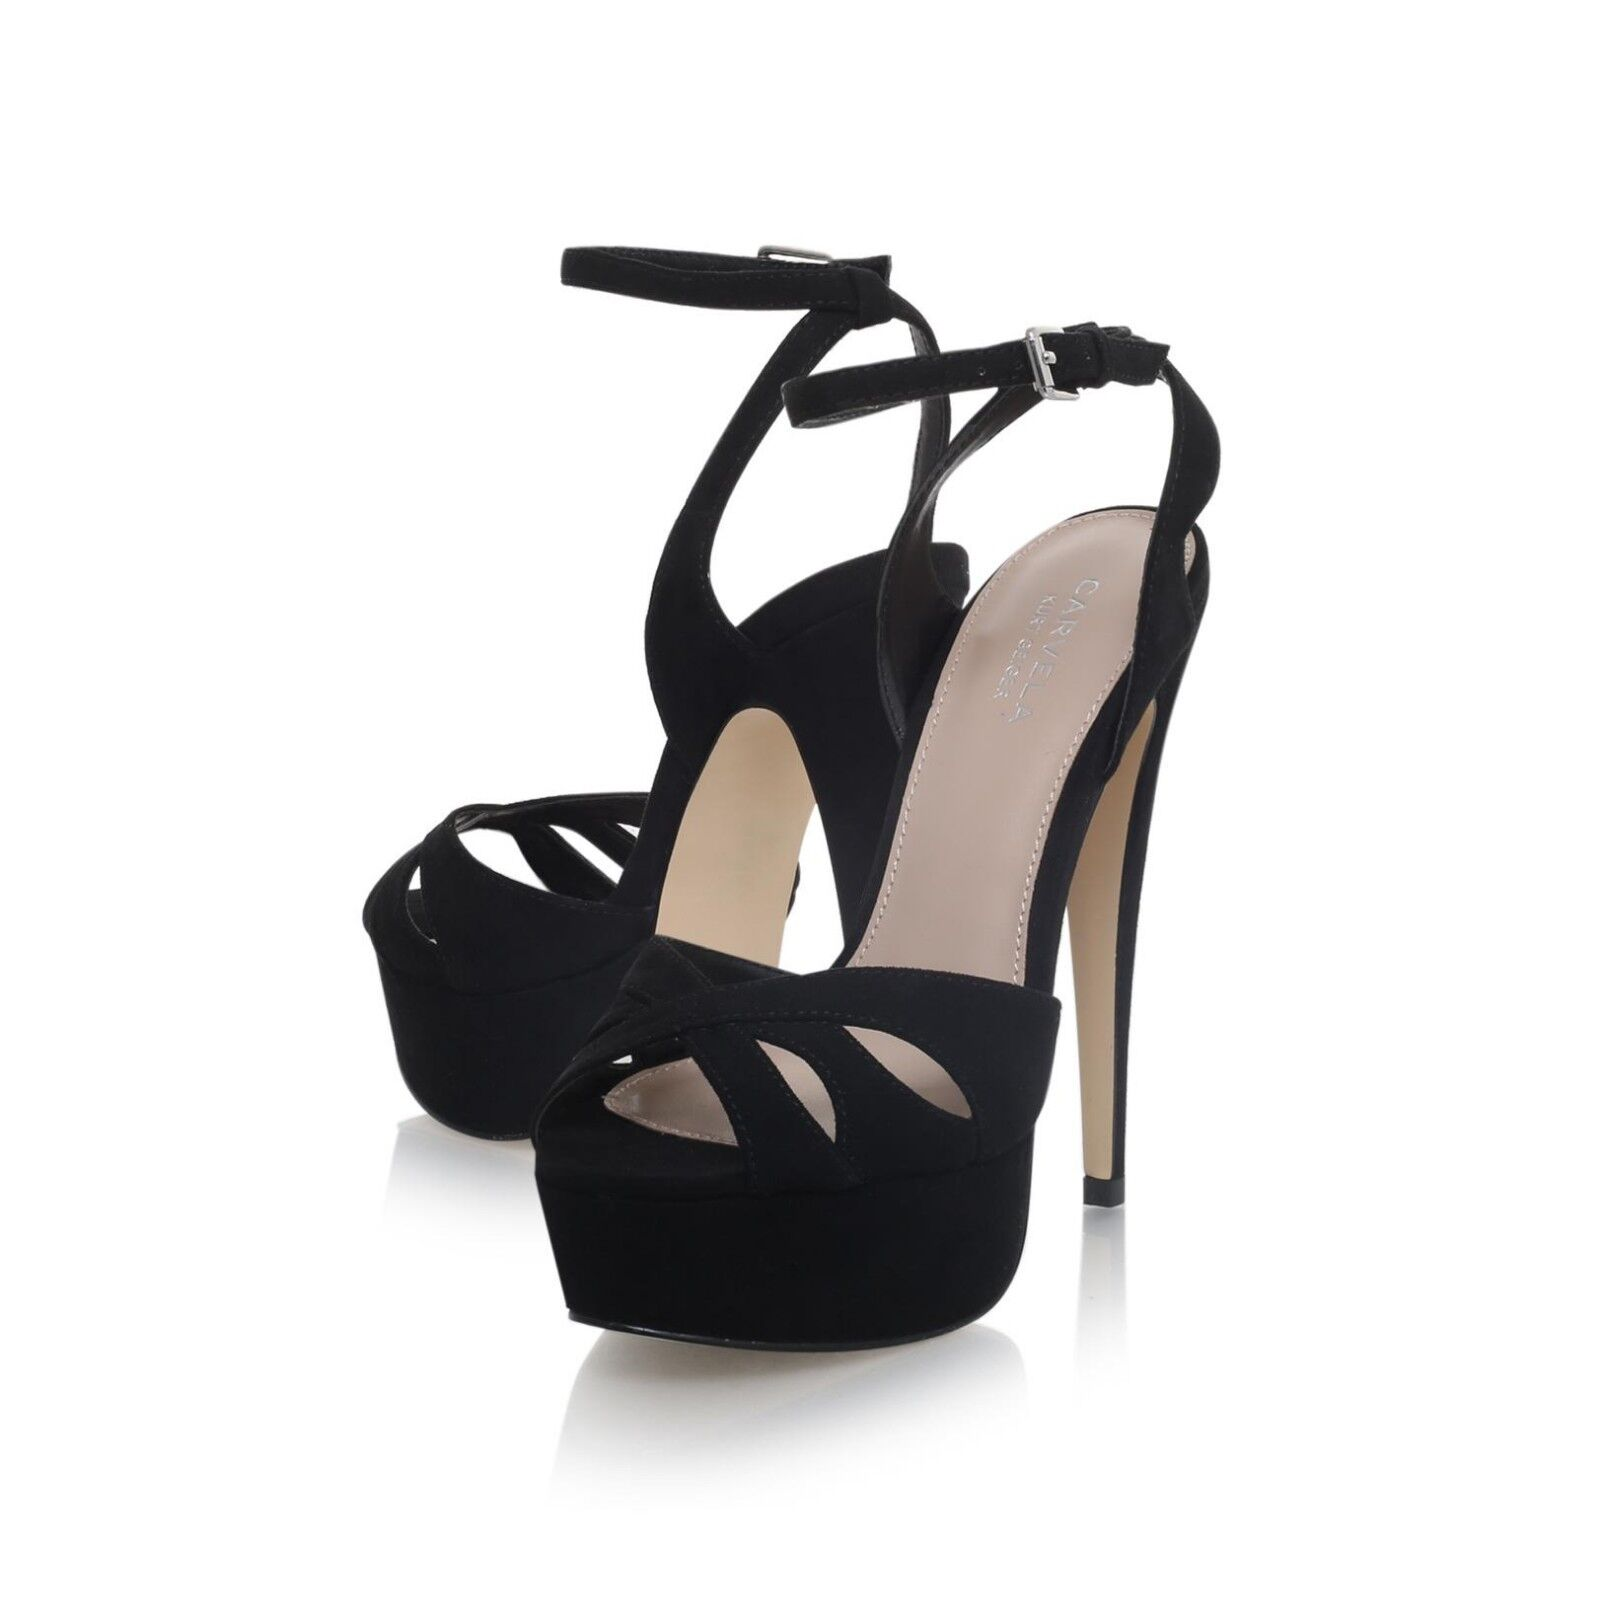 Carvela Black Layer High Heel Sandals rrp UK 3 EU 36 CH10 60